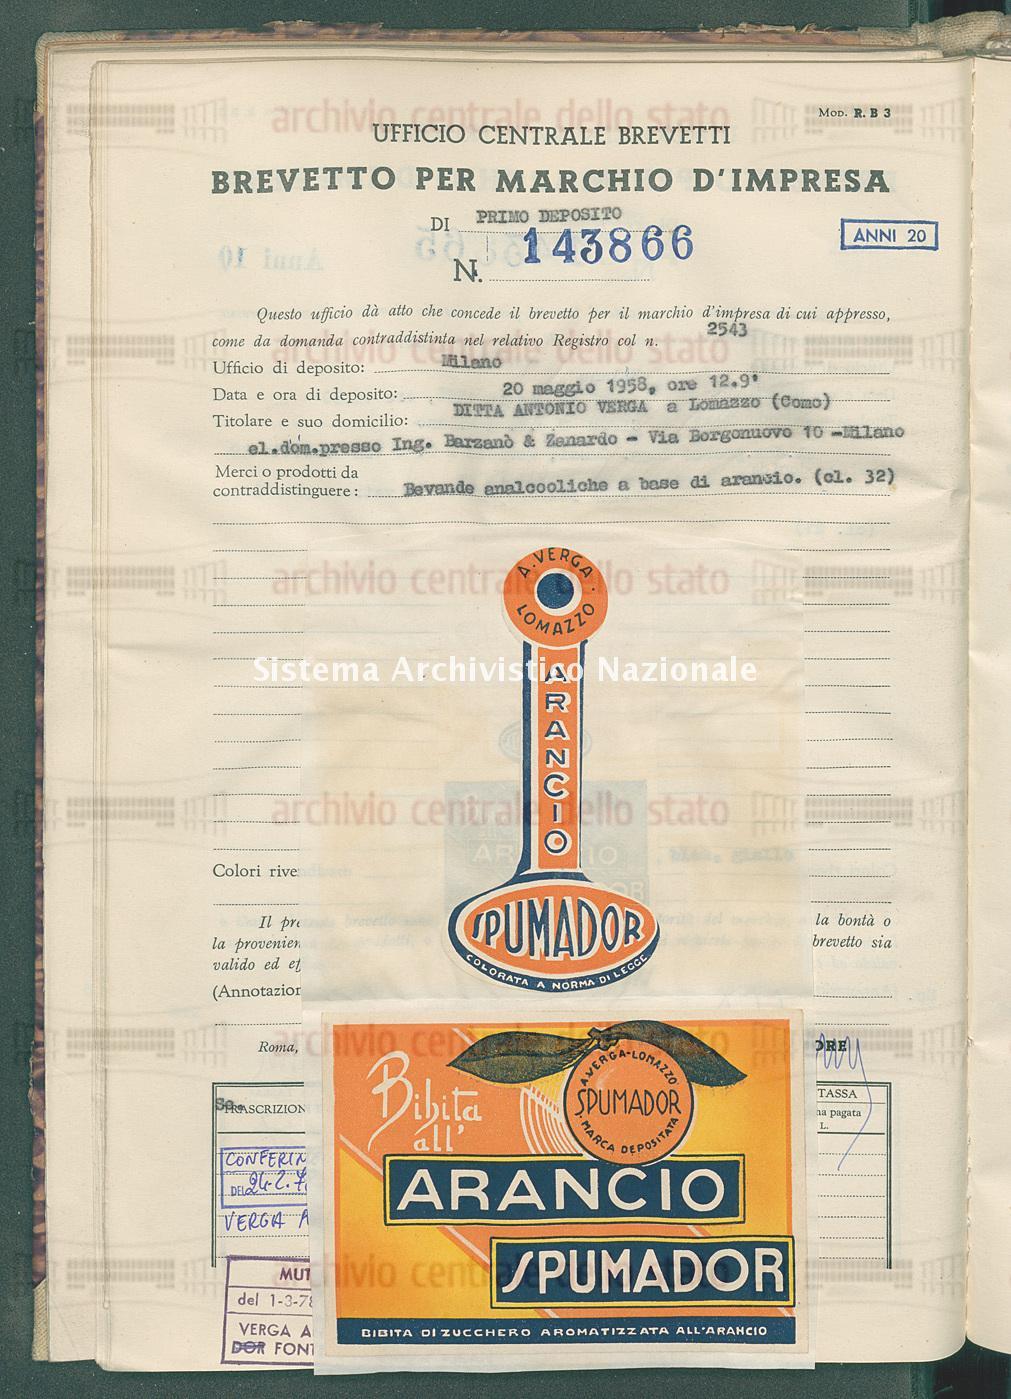 Bevande analcooliche a base ecc. Ditta Antonio Verga (25/05/1959)